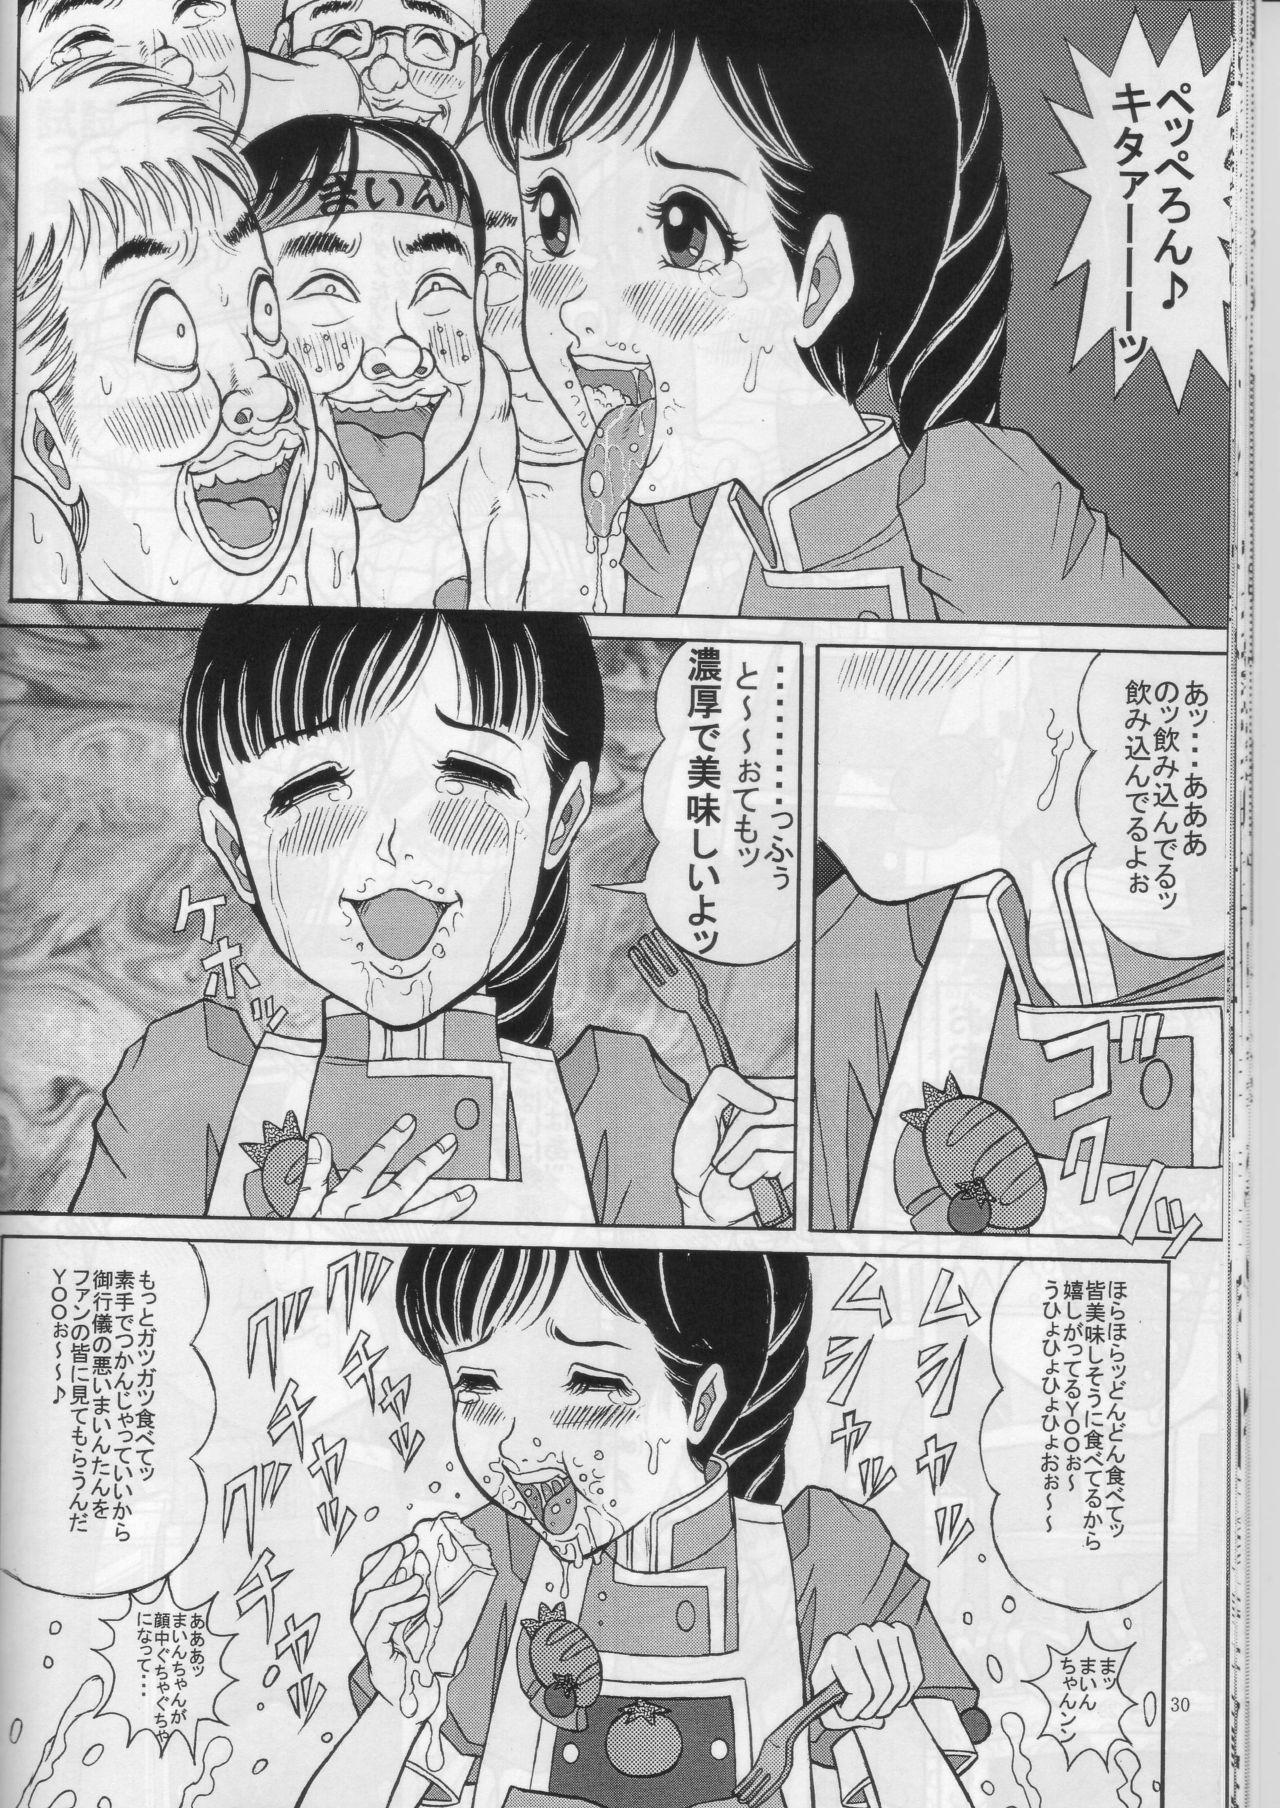 Minna de Yokumite Ara★Domo♪ Kaiseiban 28